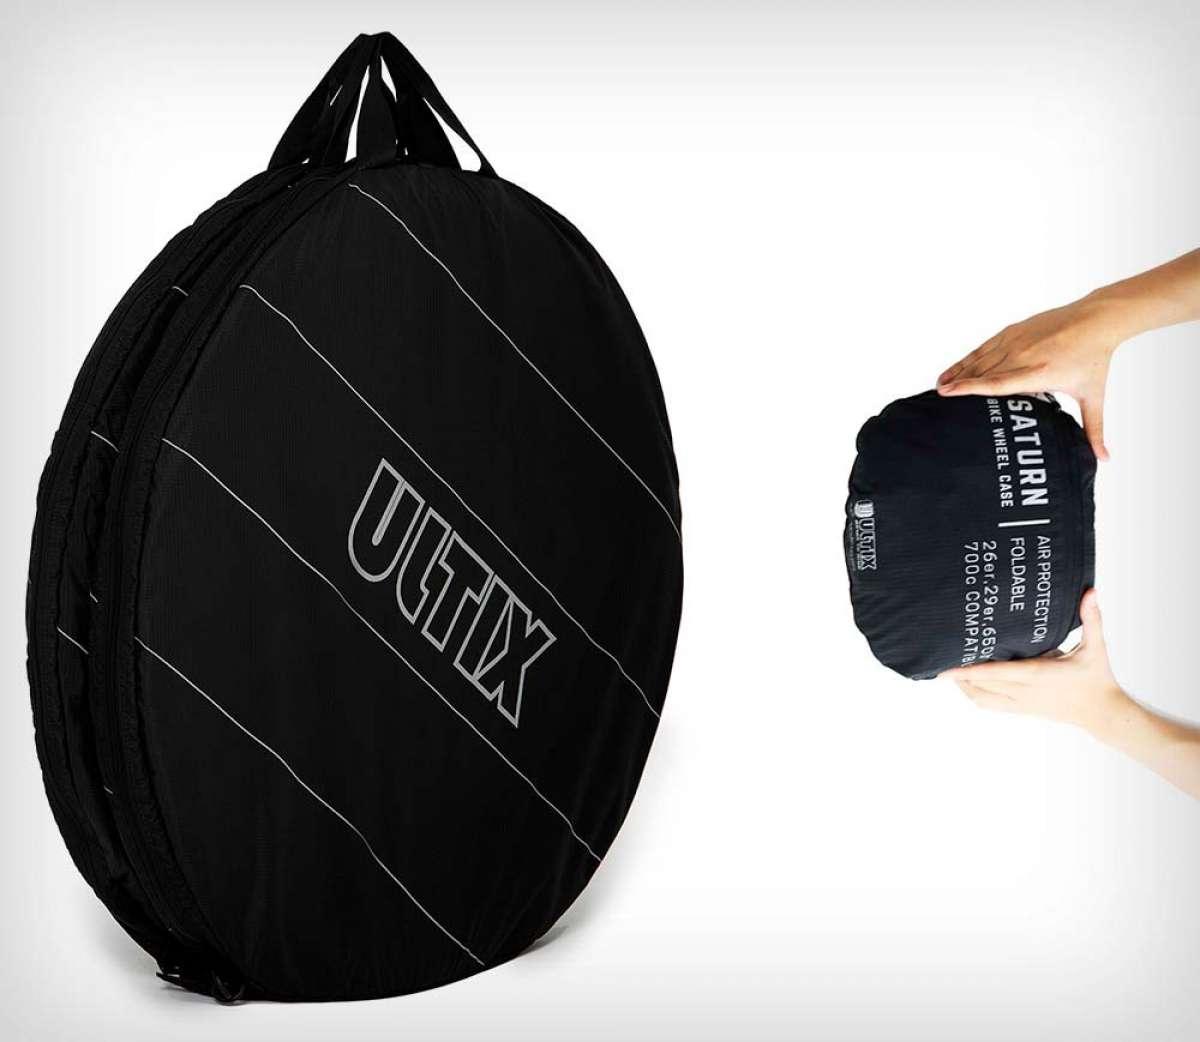 Ultix Saturn Air, una bolsa de diseño plegable y protectores inflables para transportar las ruedas de la bici